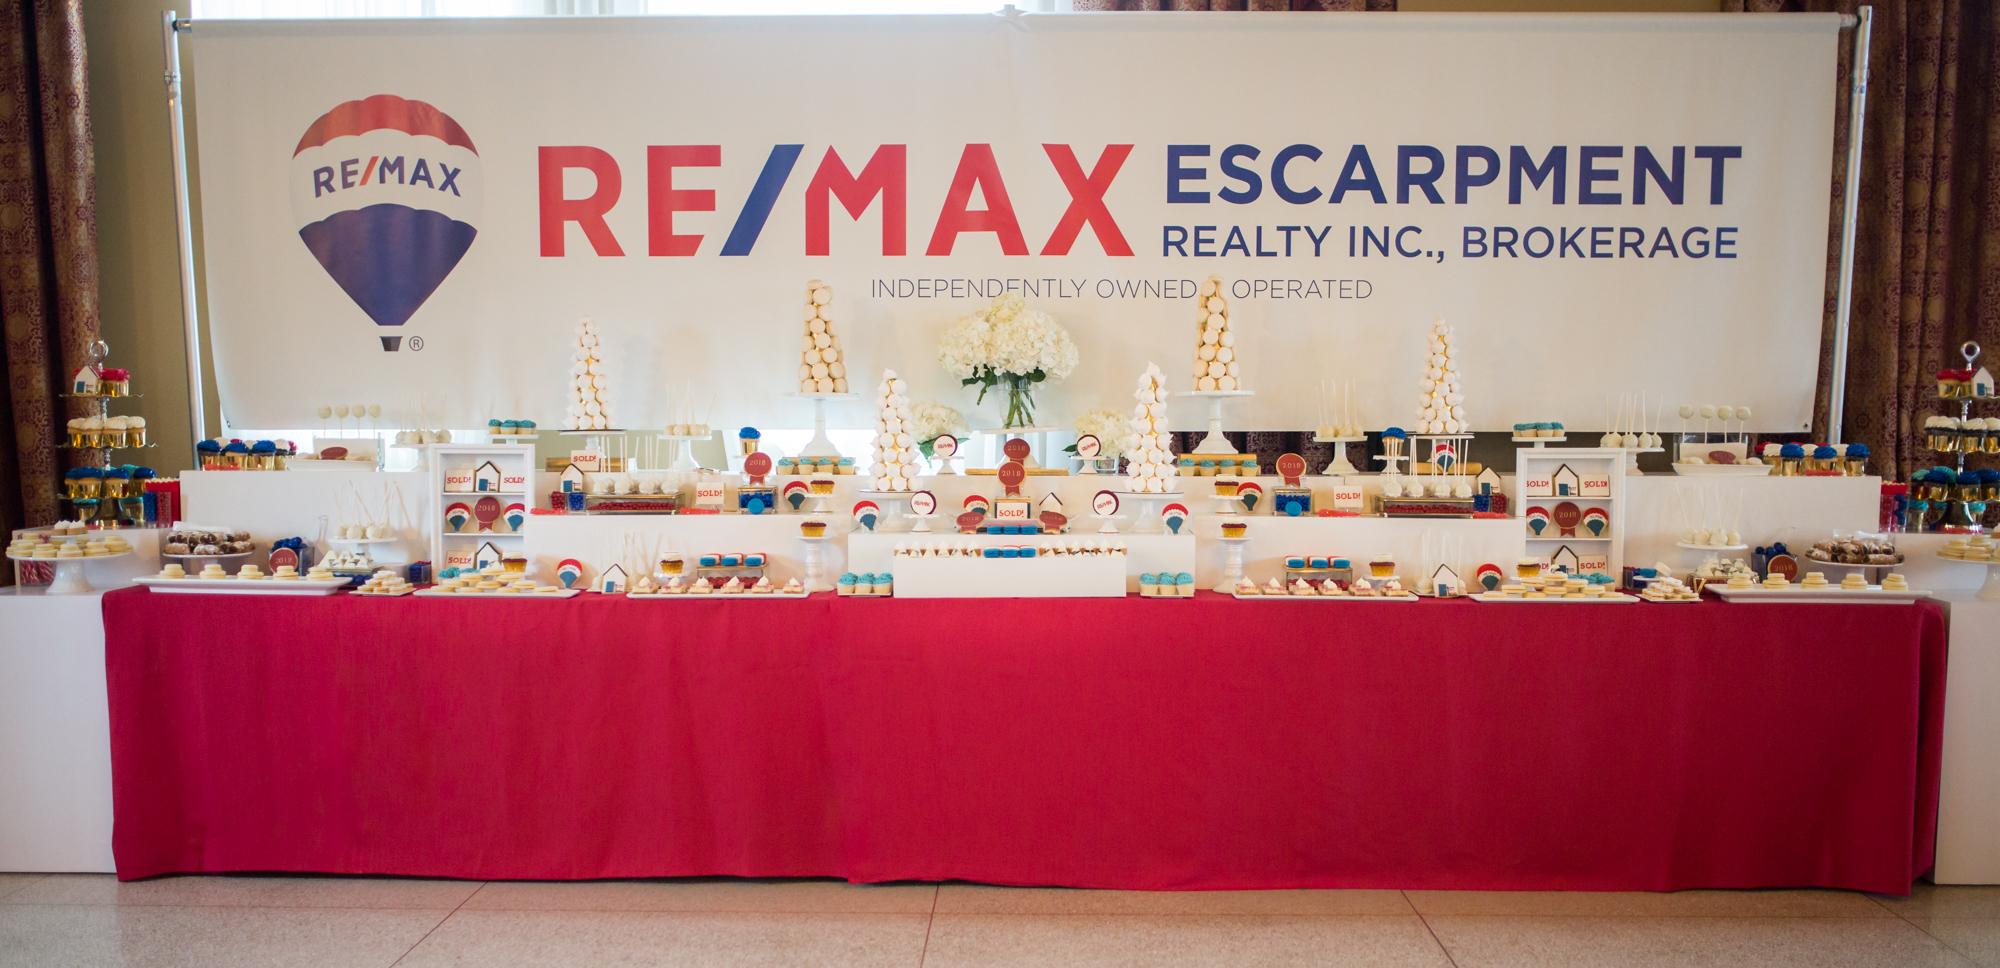 RemaRemax Escarpment Realty Corporate Sweet Tablex-Escarpment-Realty-Corporate-Event